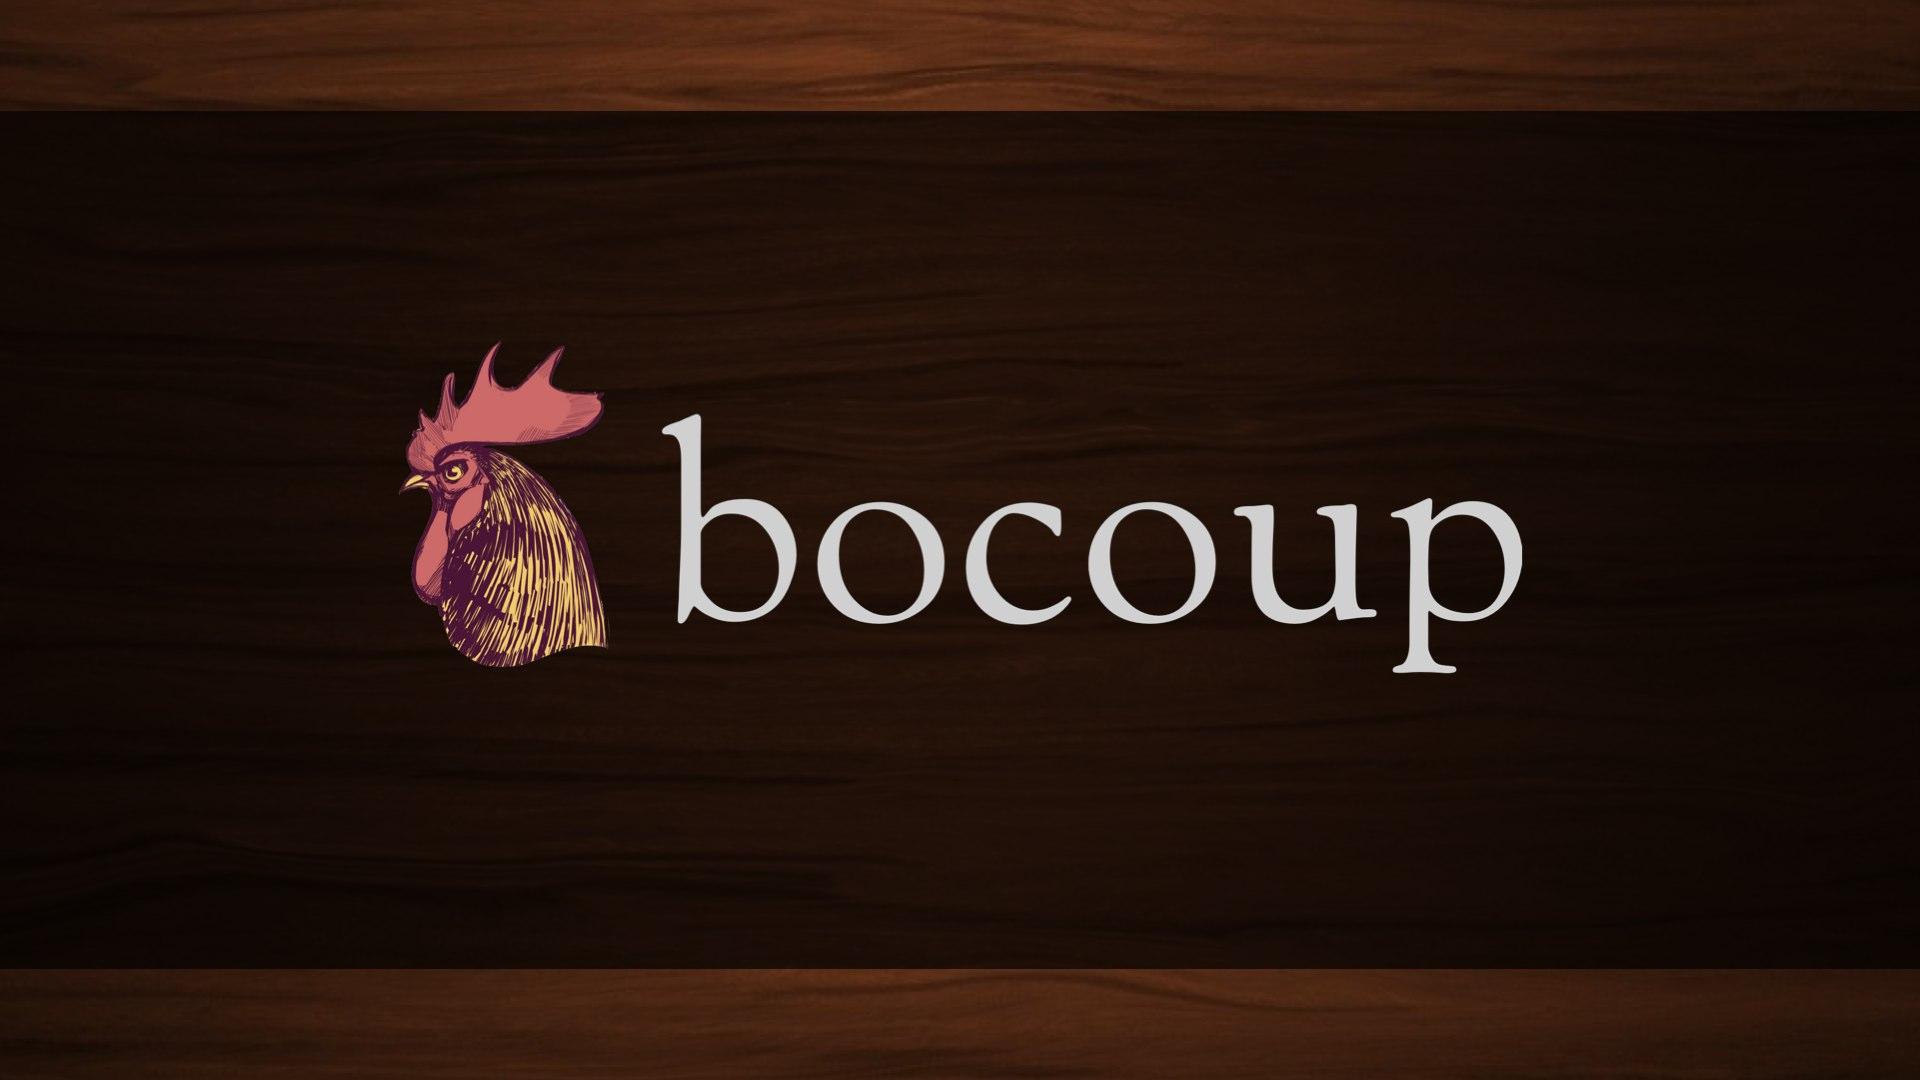 Bocoup